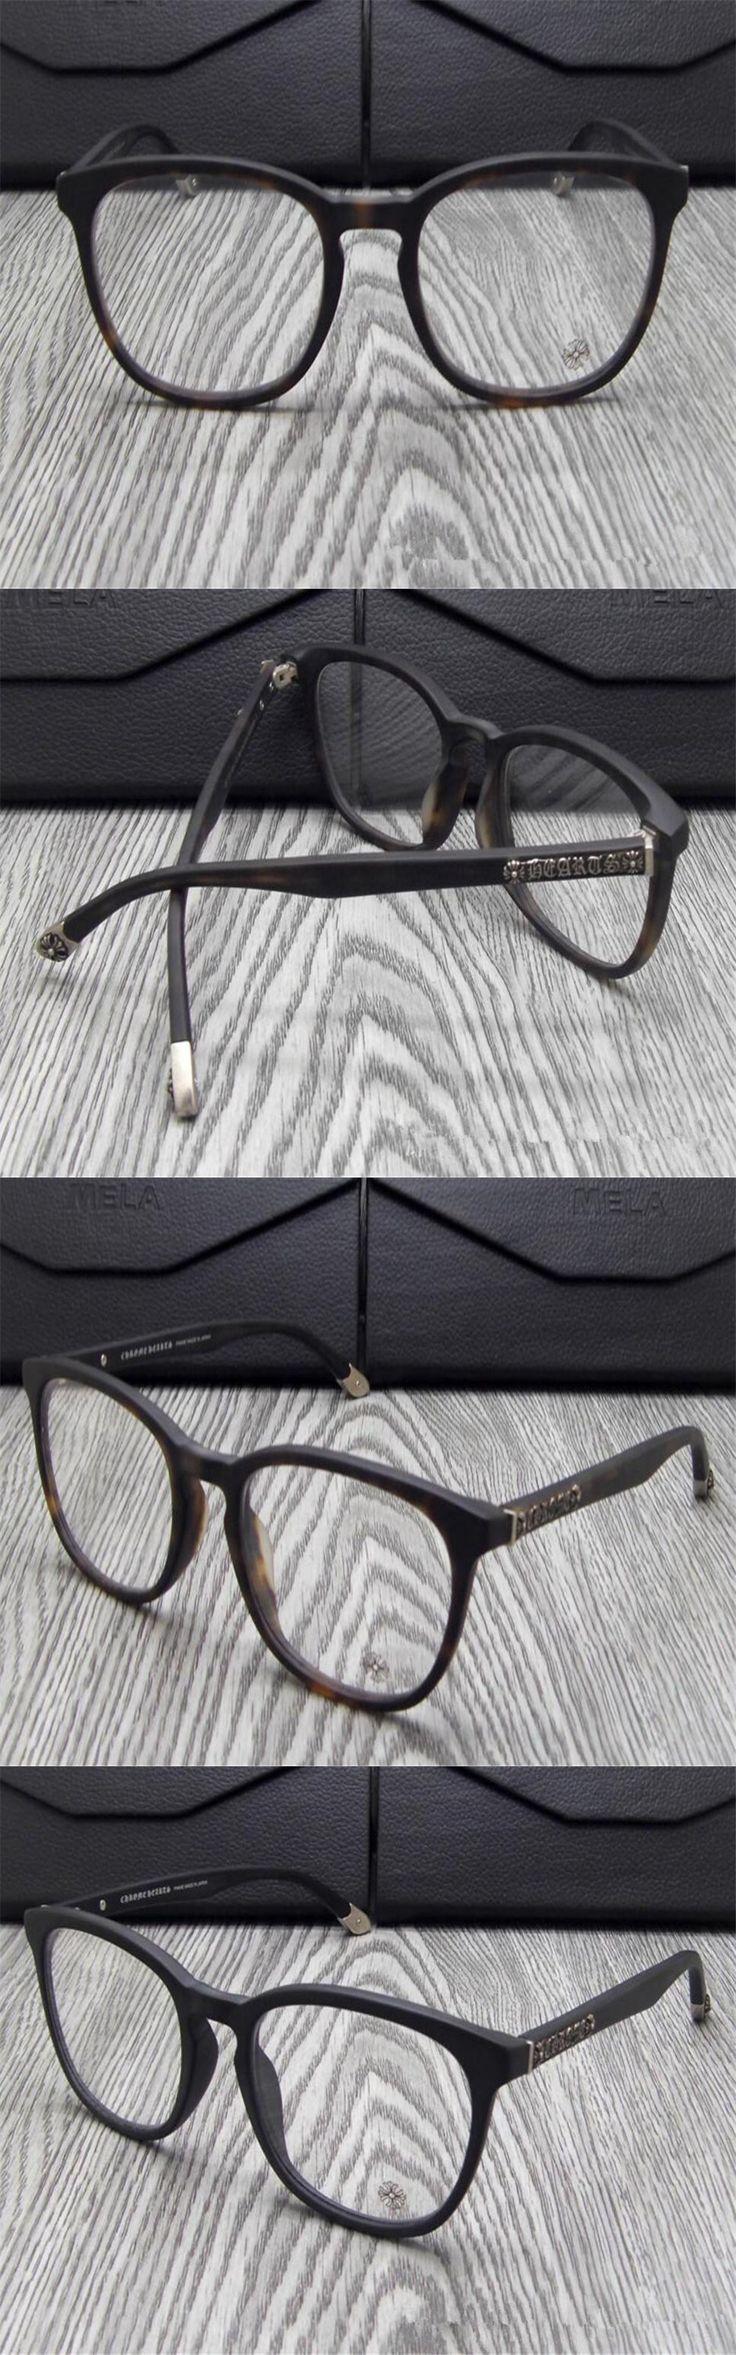 DOWER ME Fashion Unisex Acetate Full rim Retro Matte Black Leopard Presbyopia Optical Eyewear Frame Myopia Eyeglasses